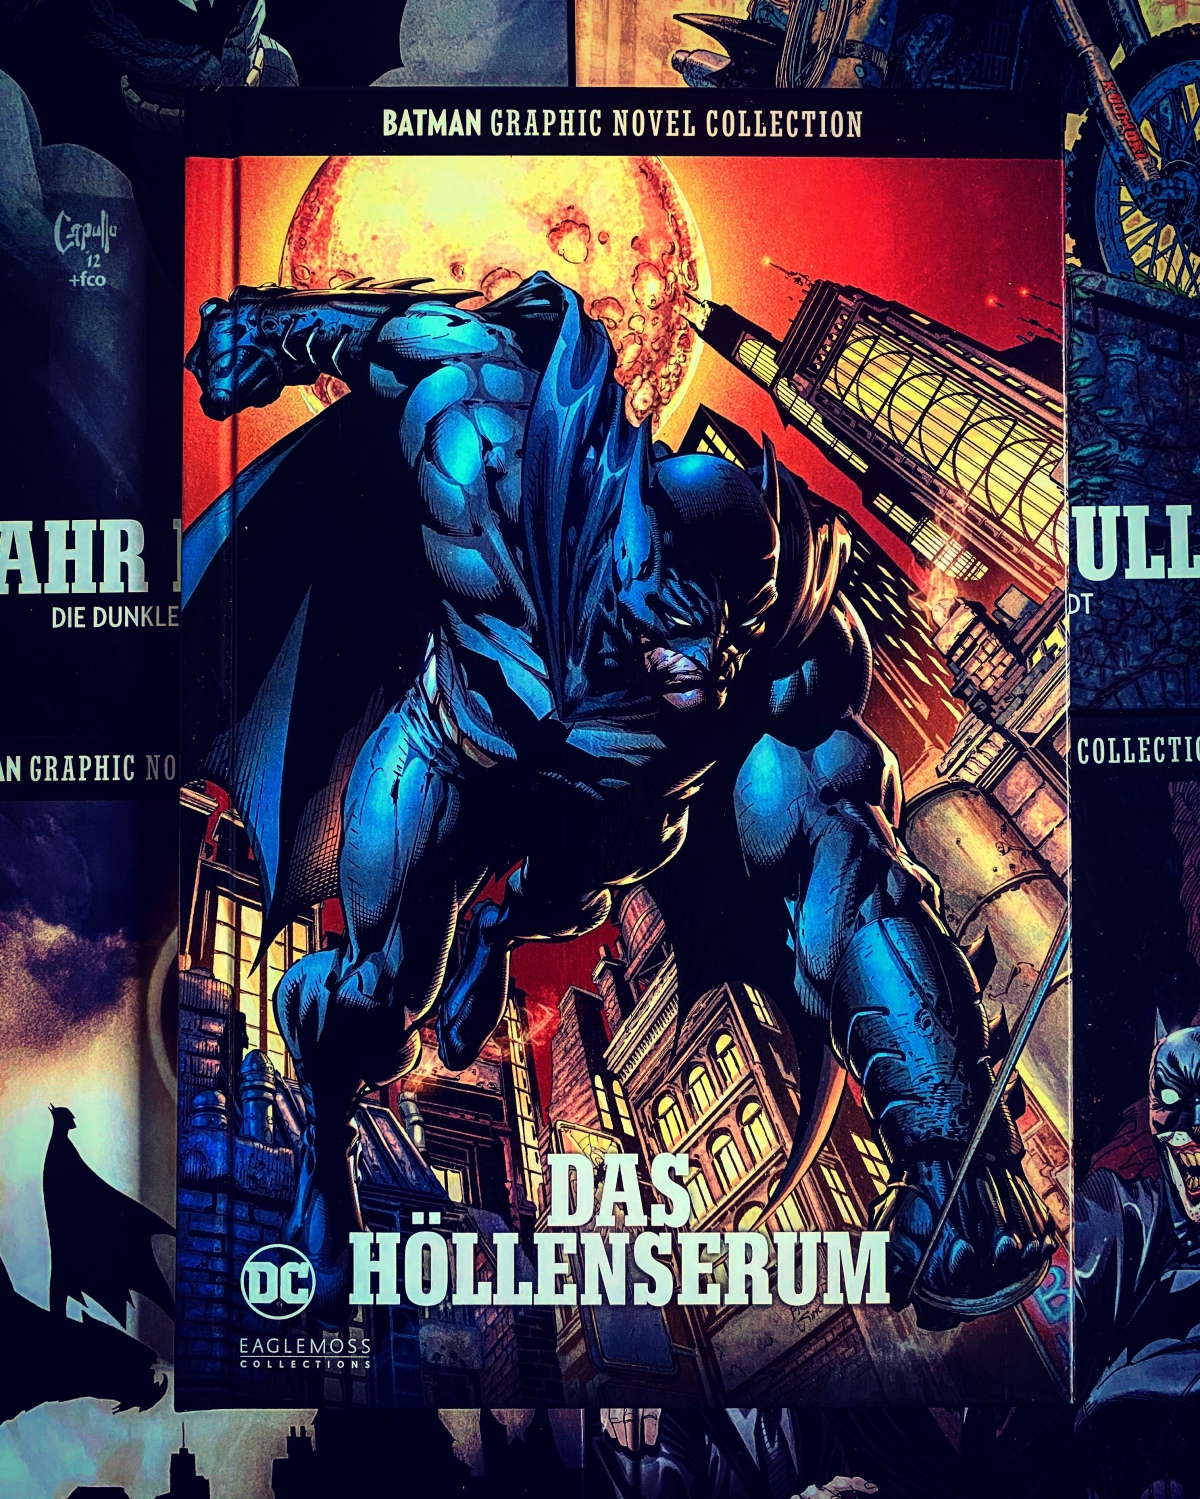 Das Höllenserum| Review | Batman Graphic NovelCollection